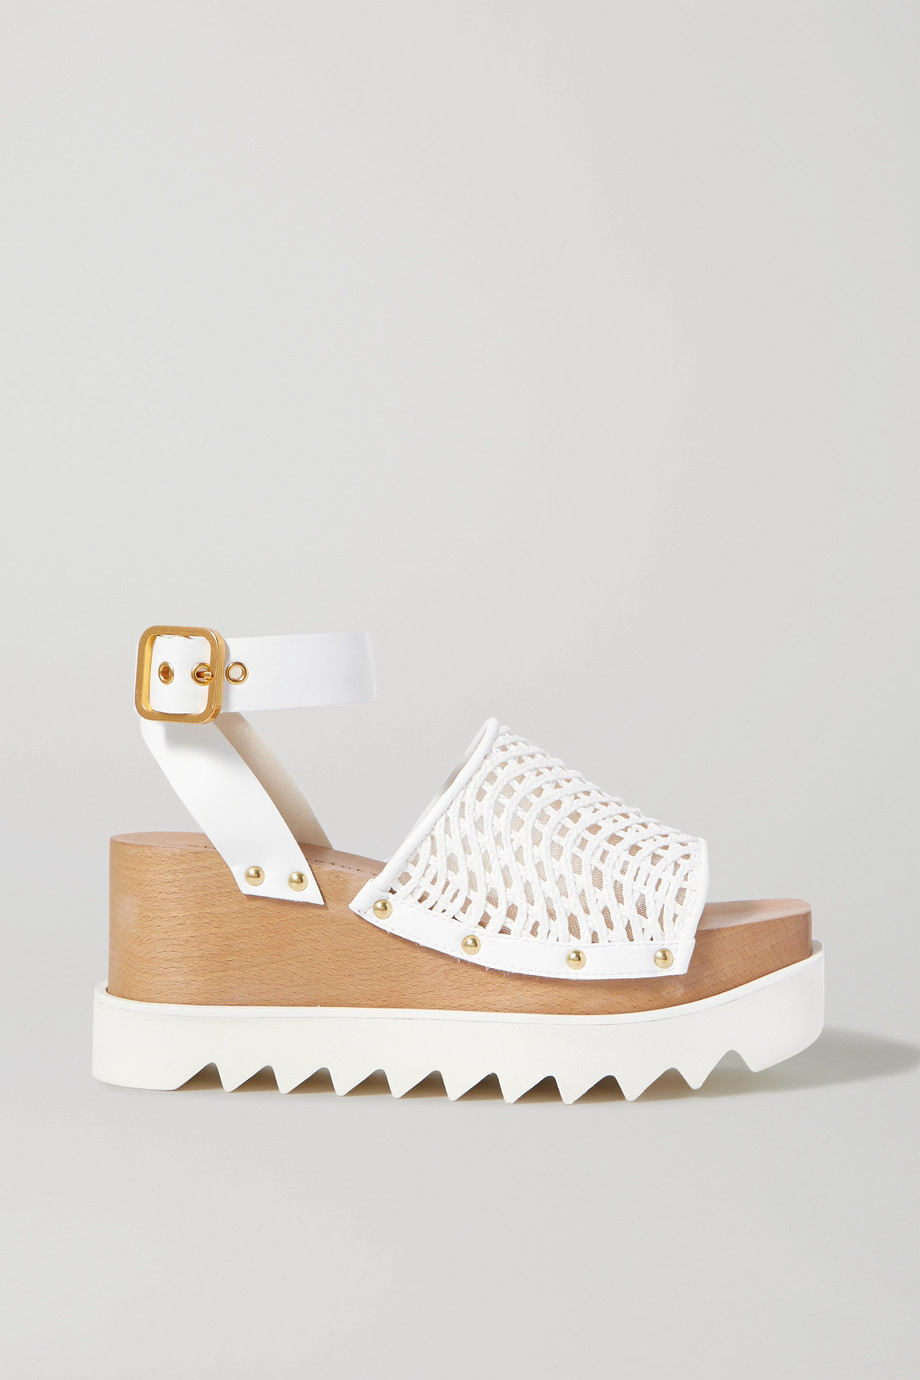 Stella McCartney Elyse raffia and vegetarian leather platform sandals